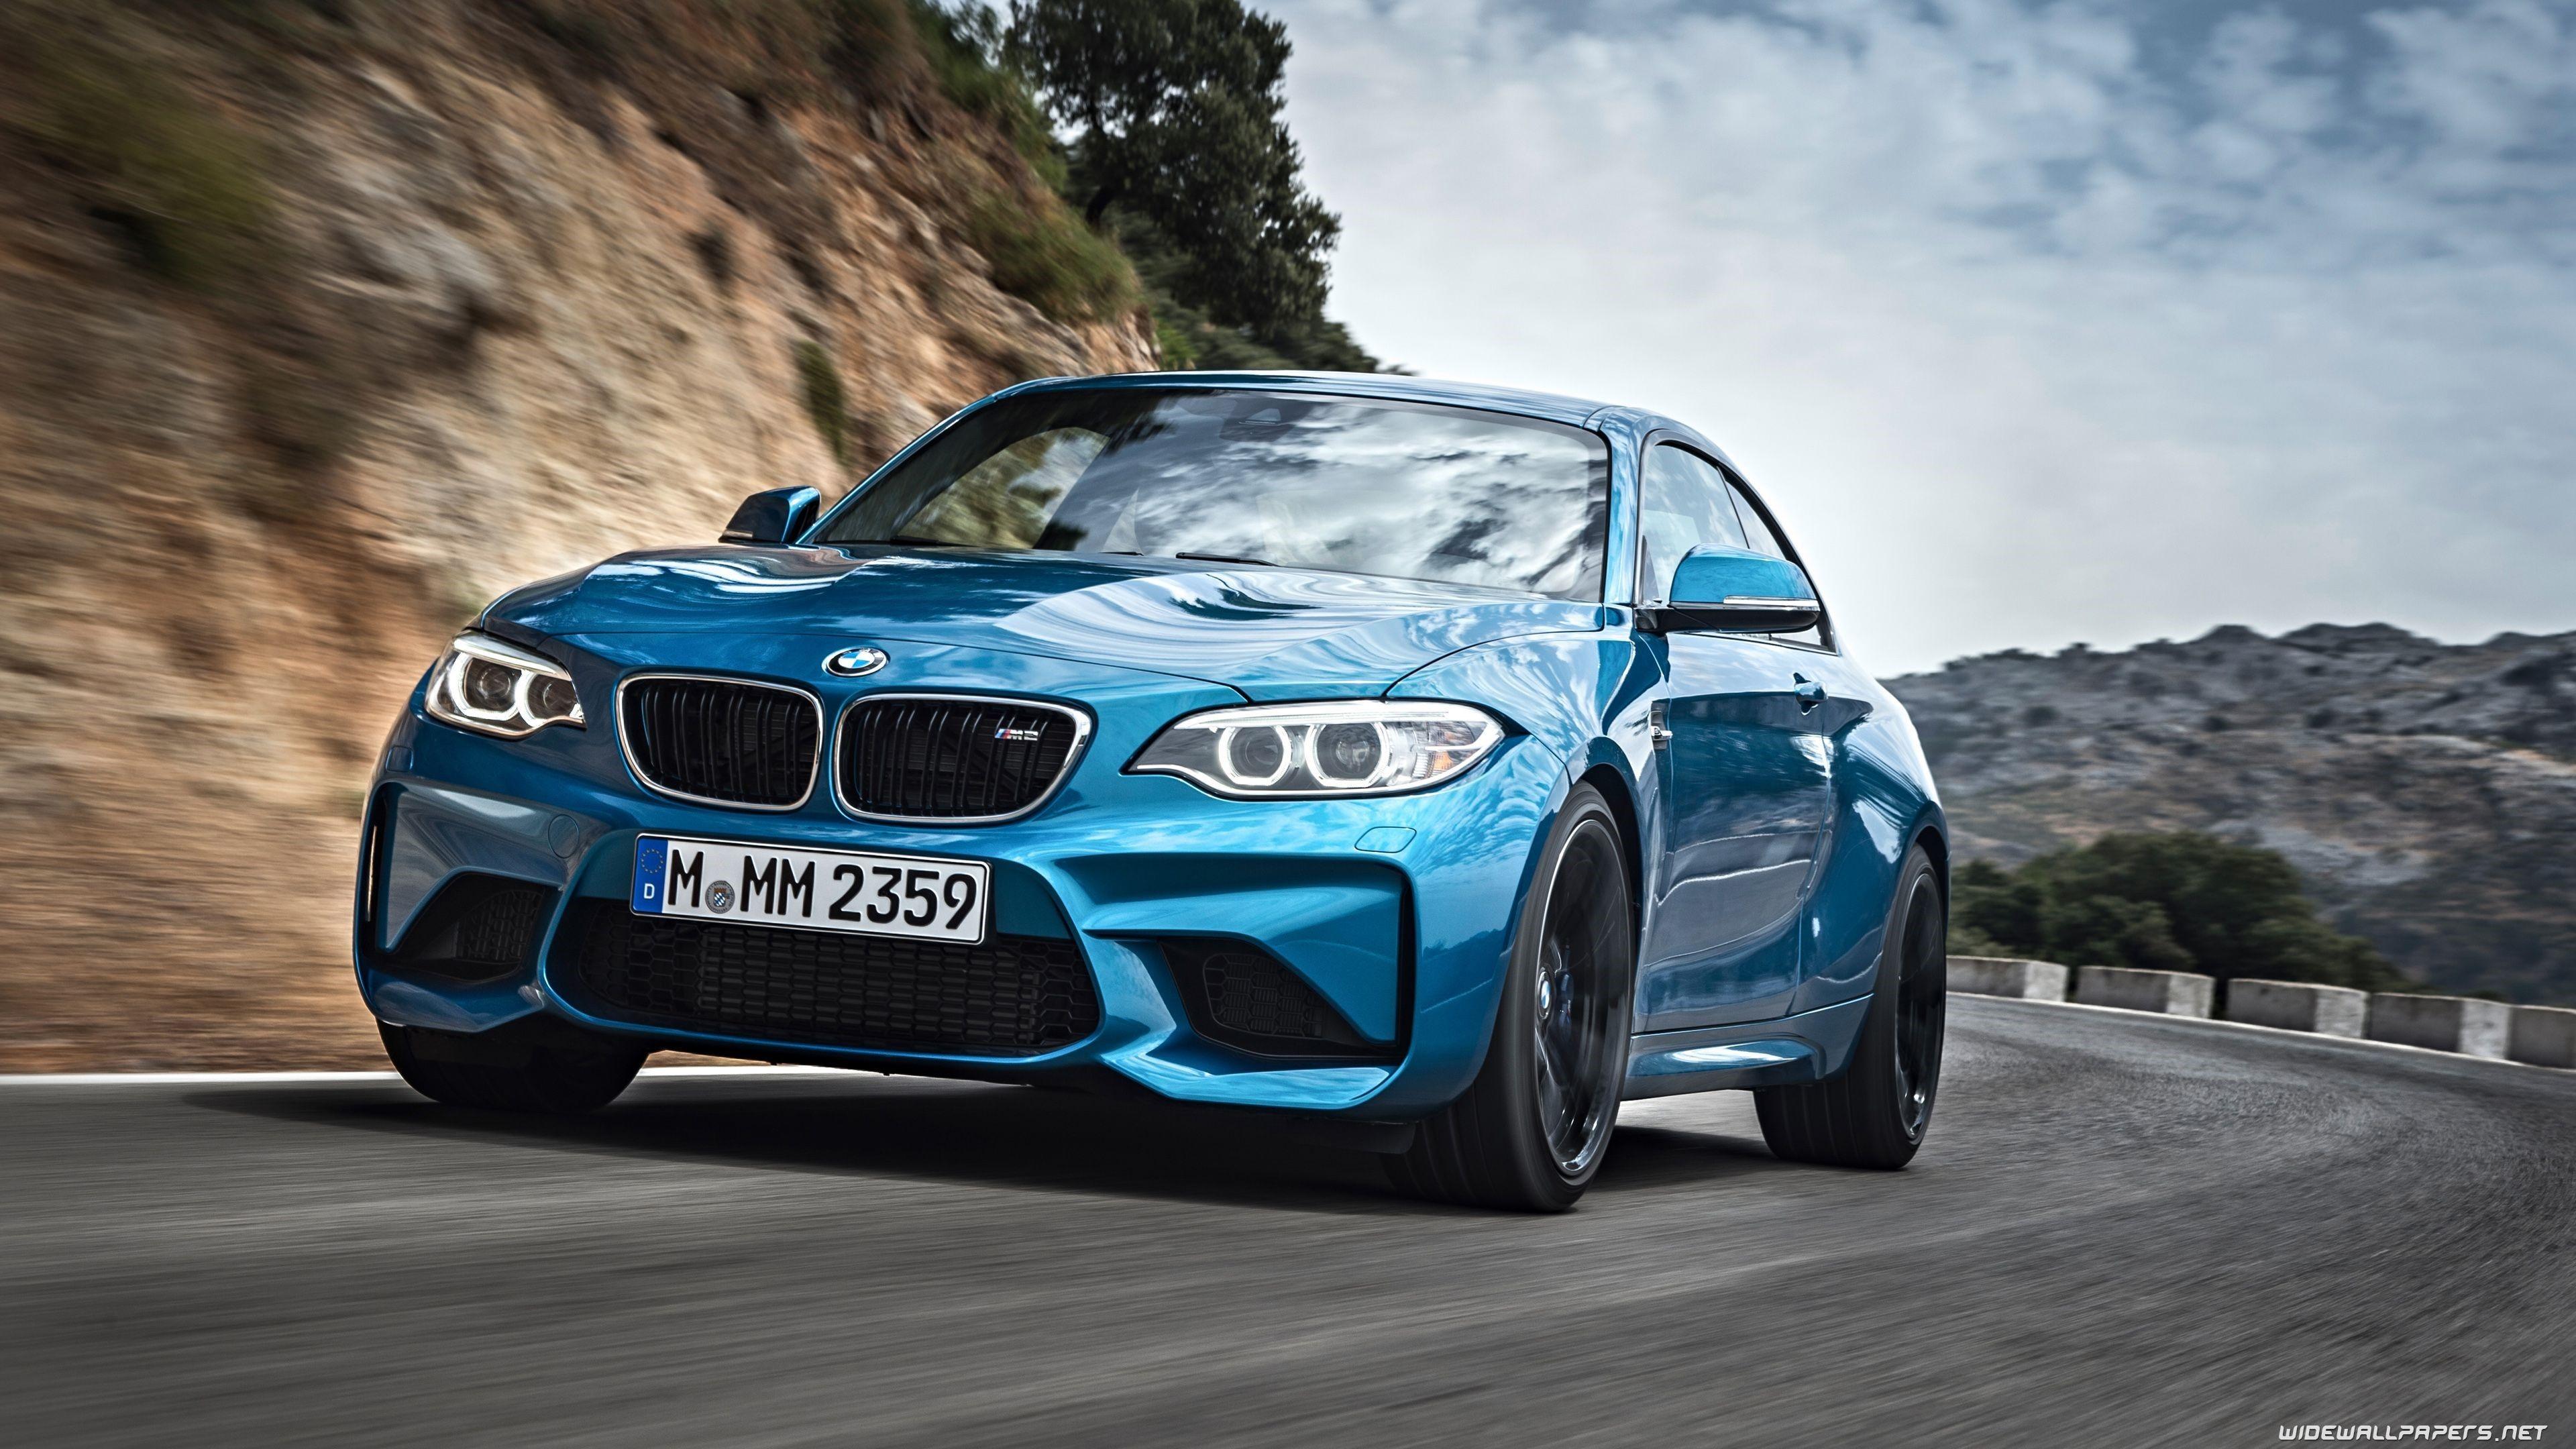 4K BMW UHD Wallpapers